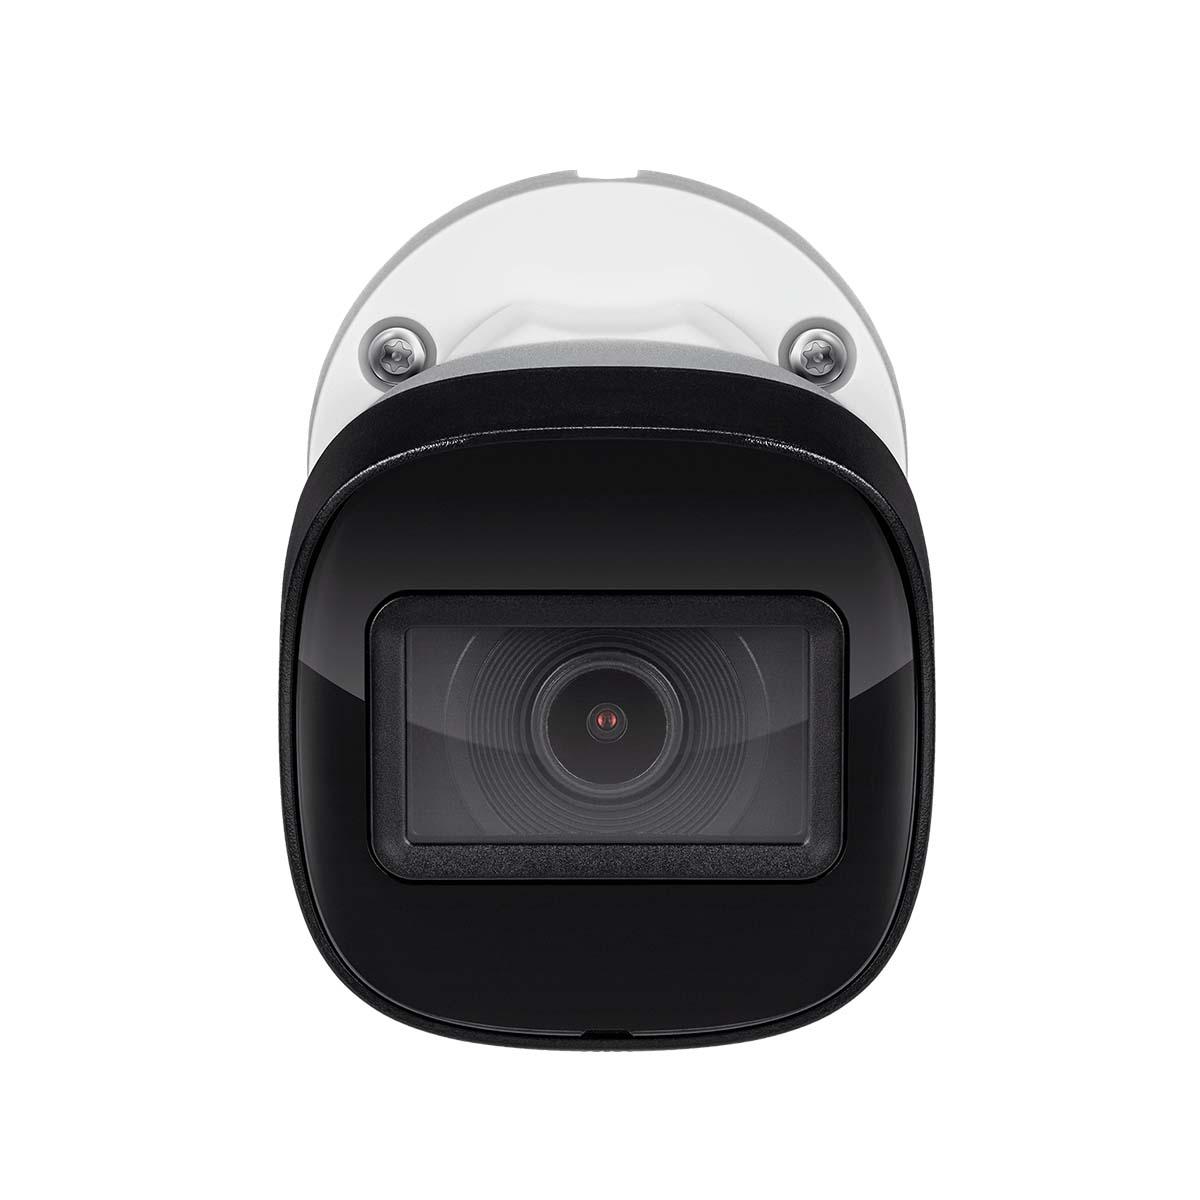 Kit 03 Câmera Bullet Intelbras Vhd 1120 B G6 720p 2.8mm